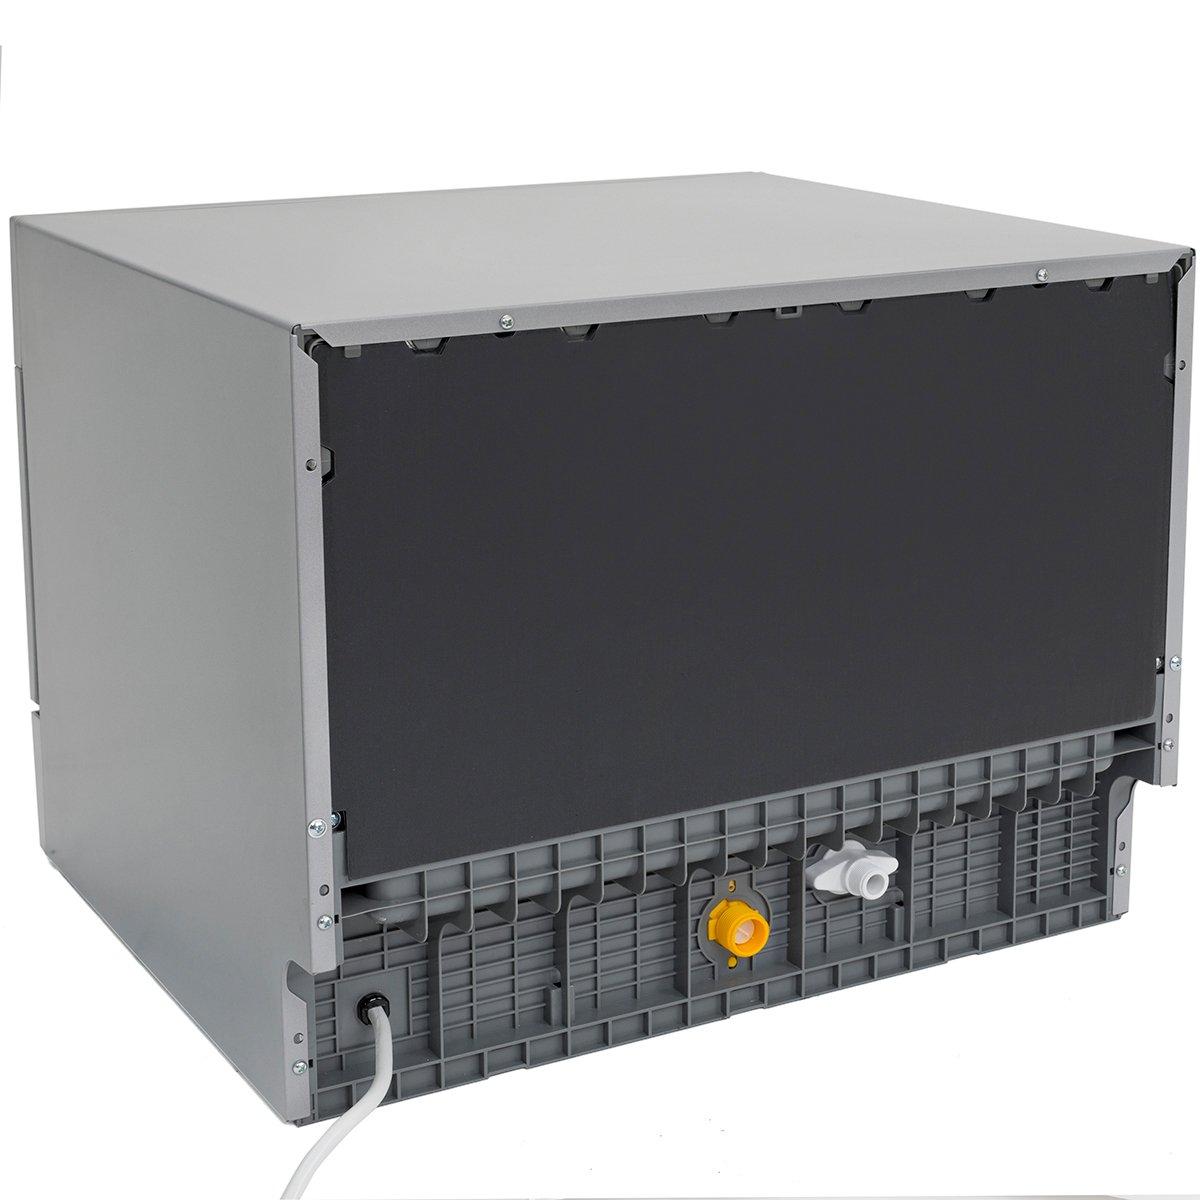 Amazon.com: Ensue Countertop Dishwasher Portable Compact Dishwashing ...